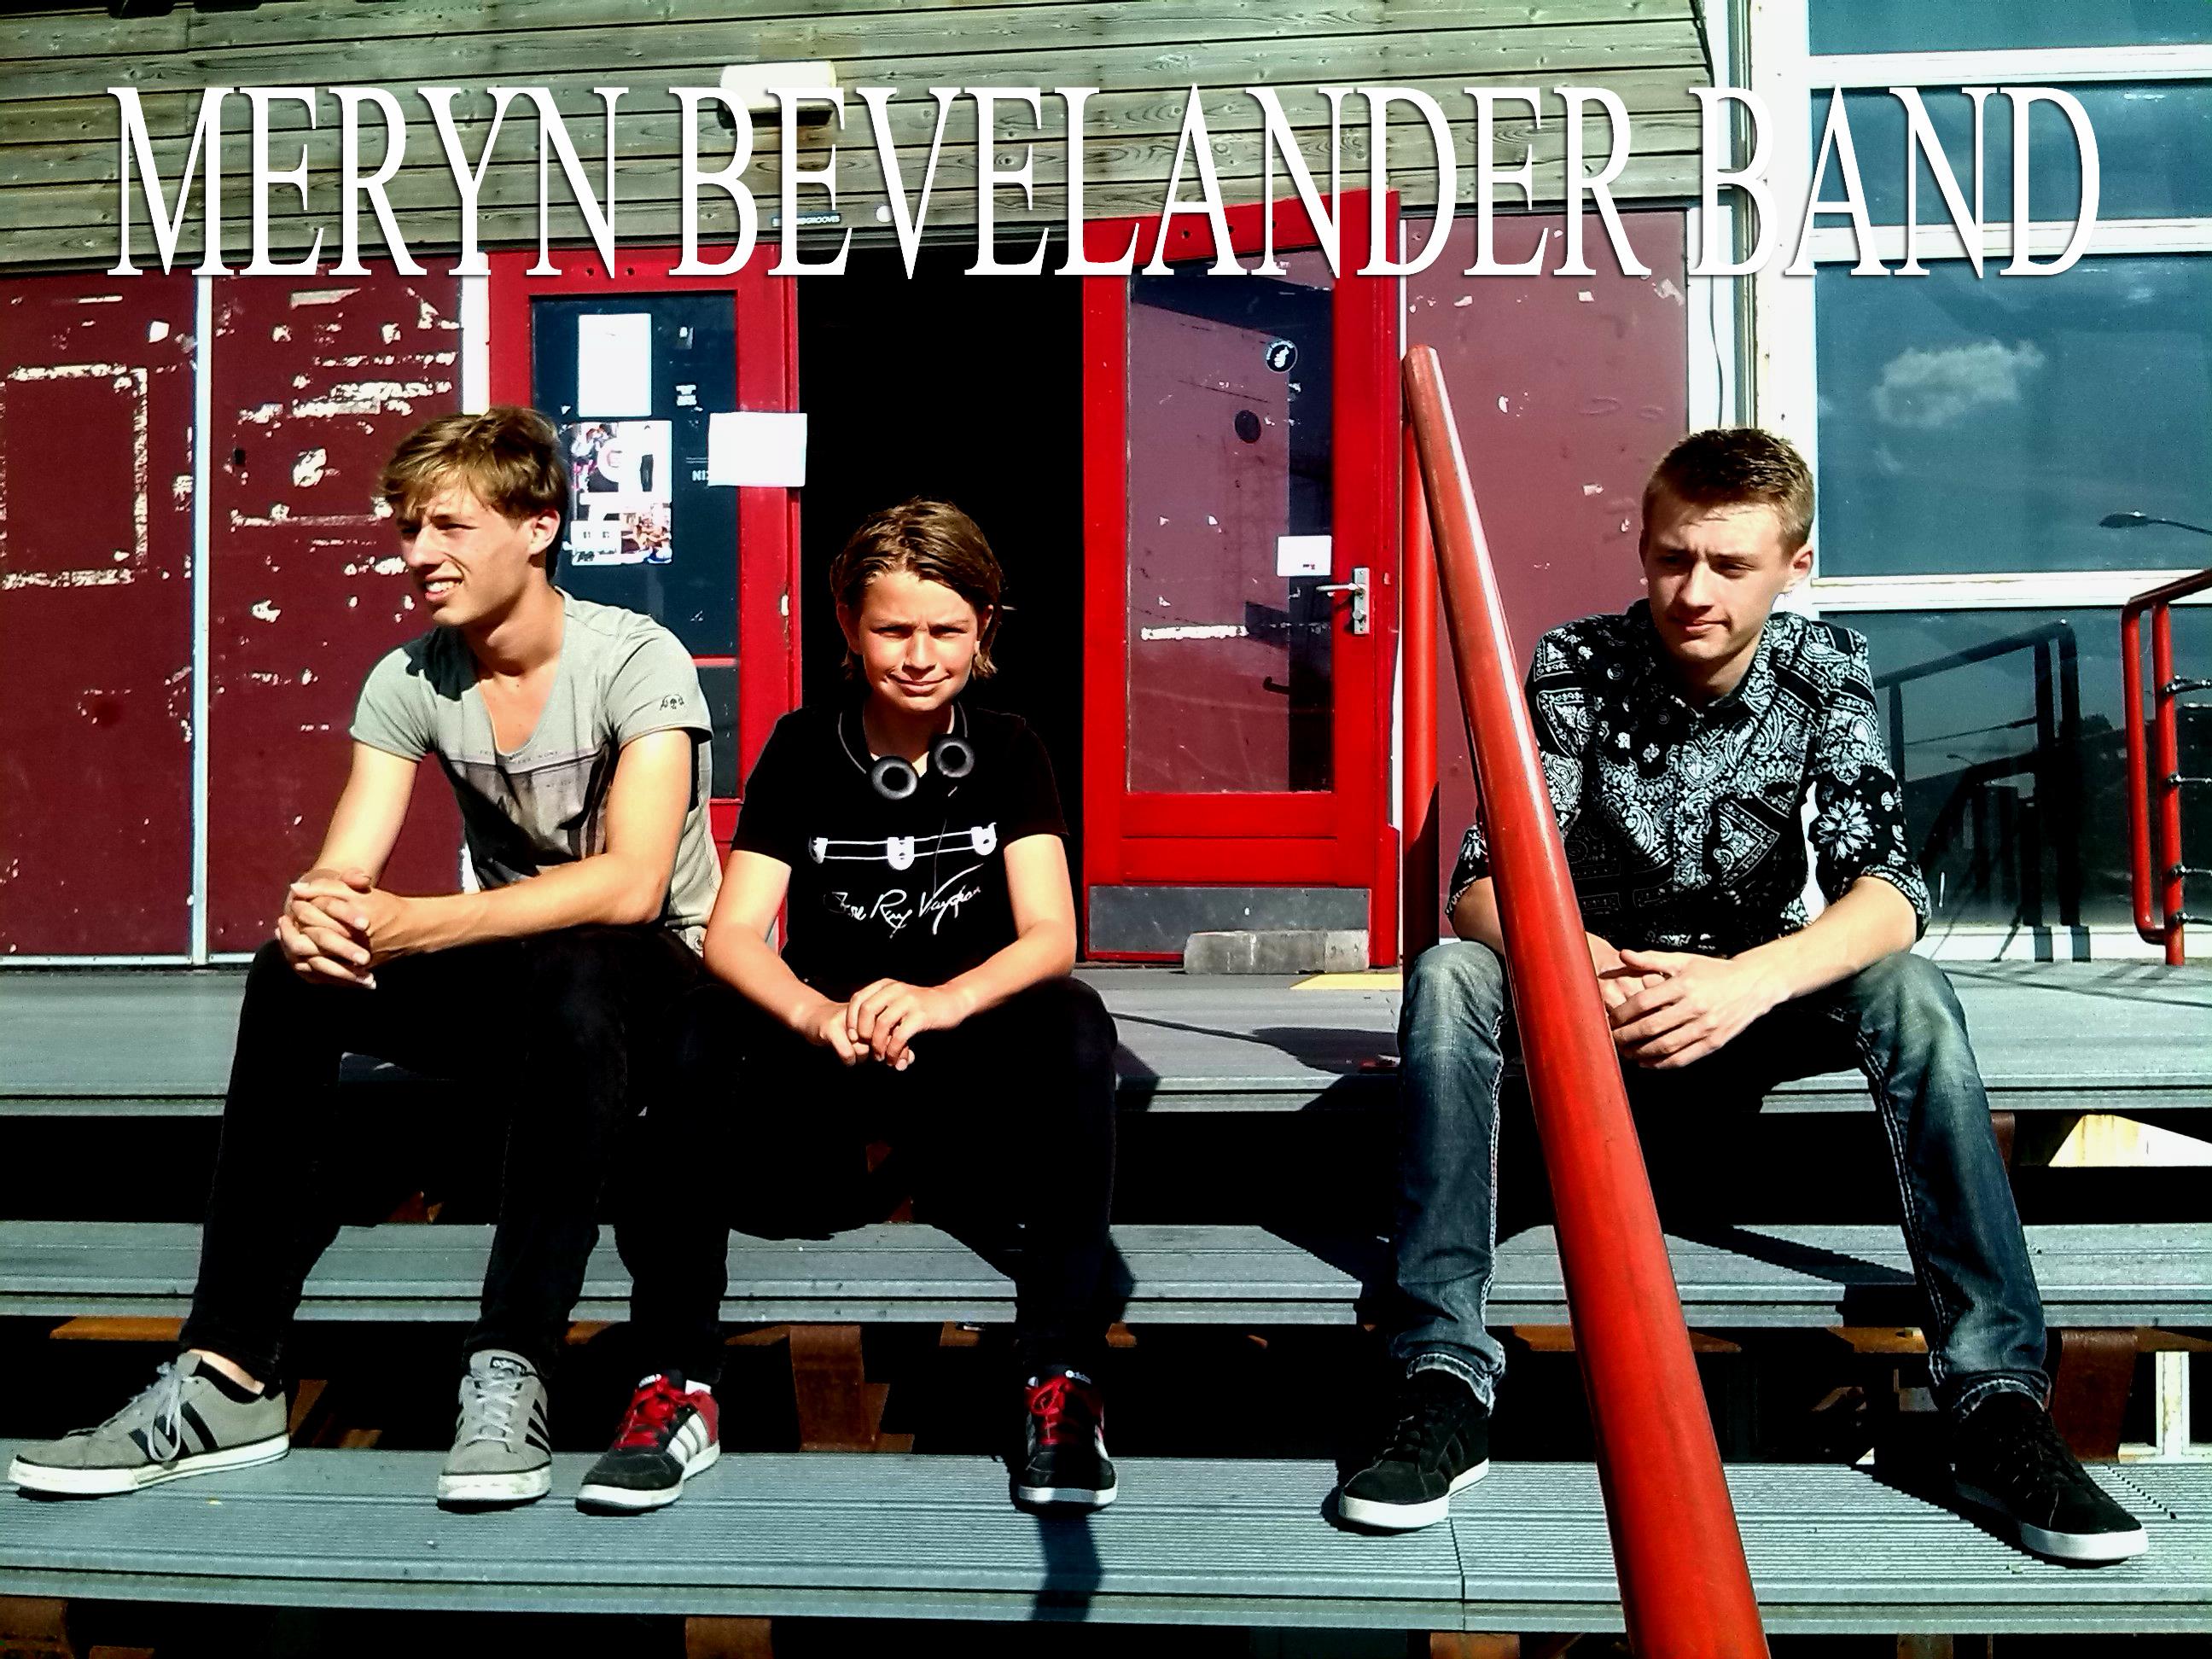 Meryn Bevelander Band